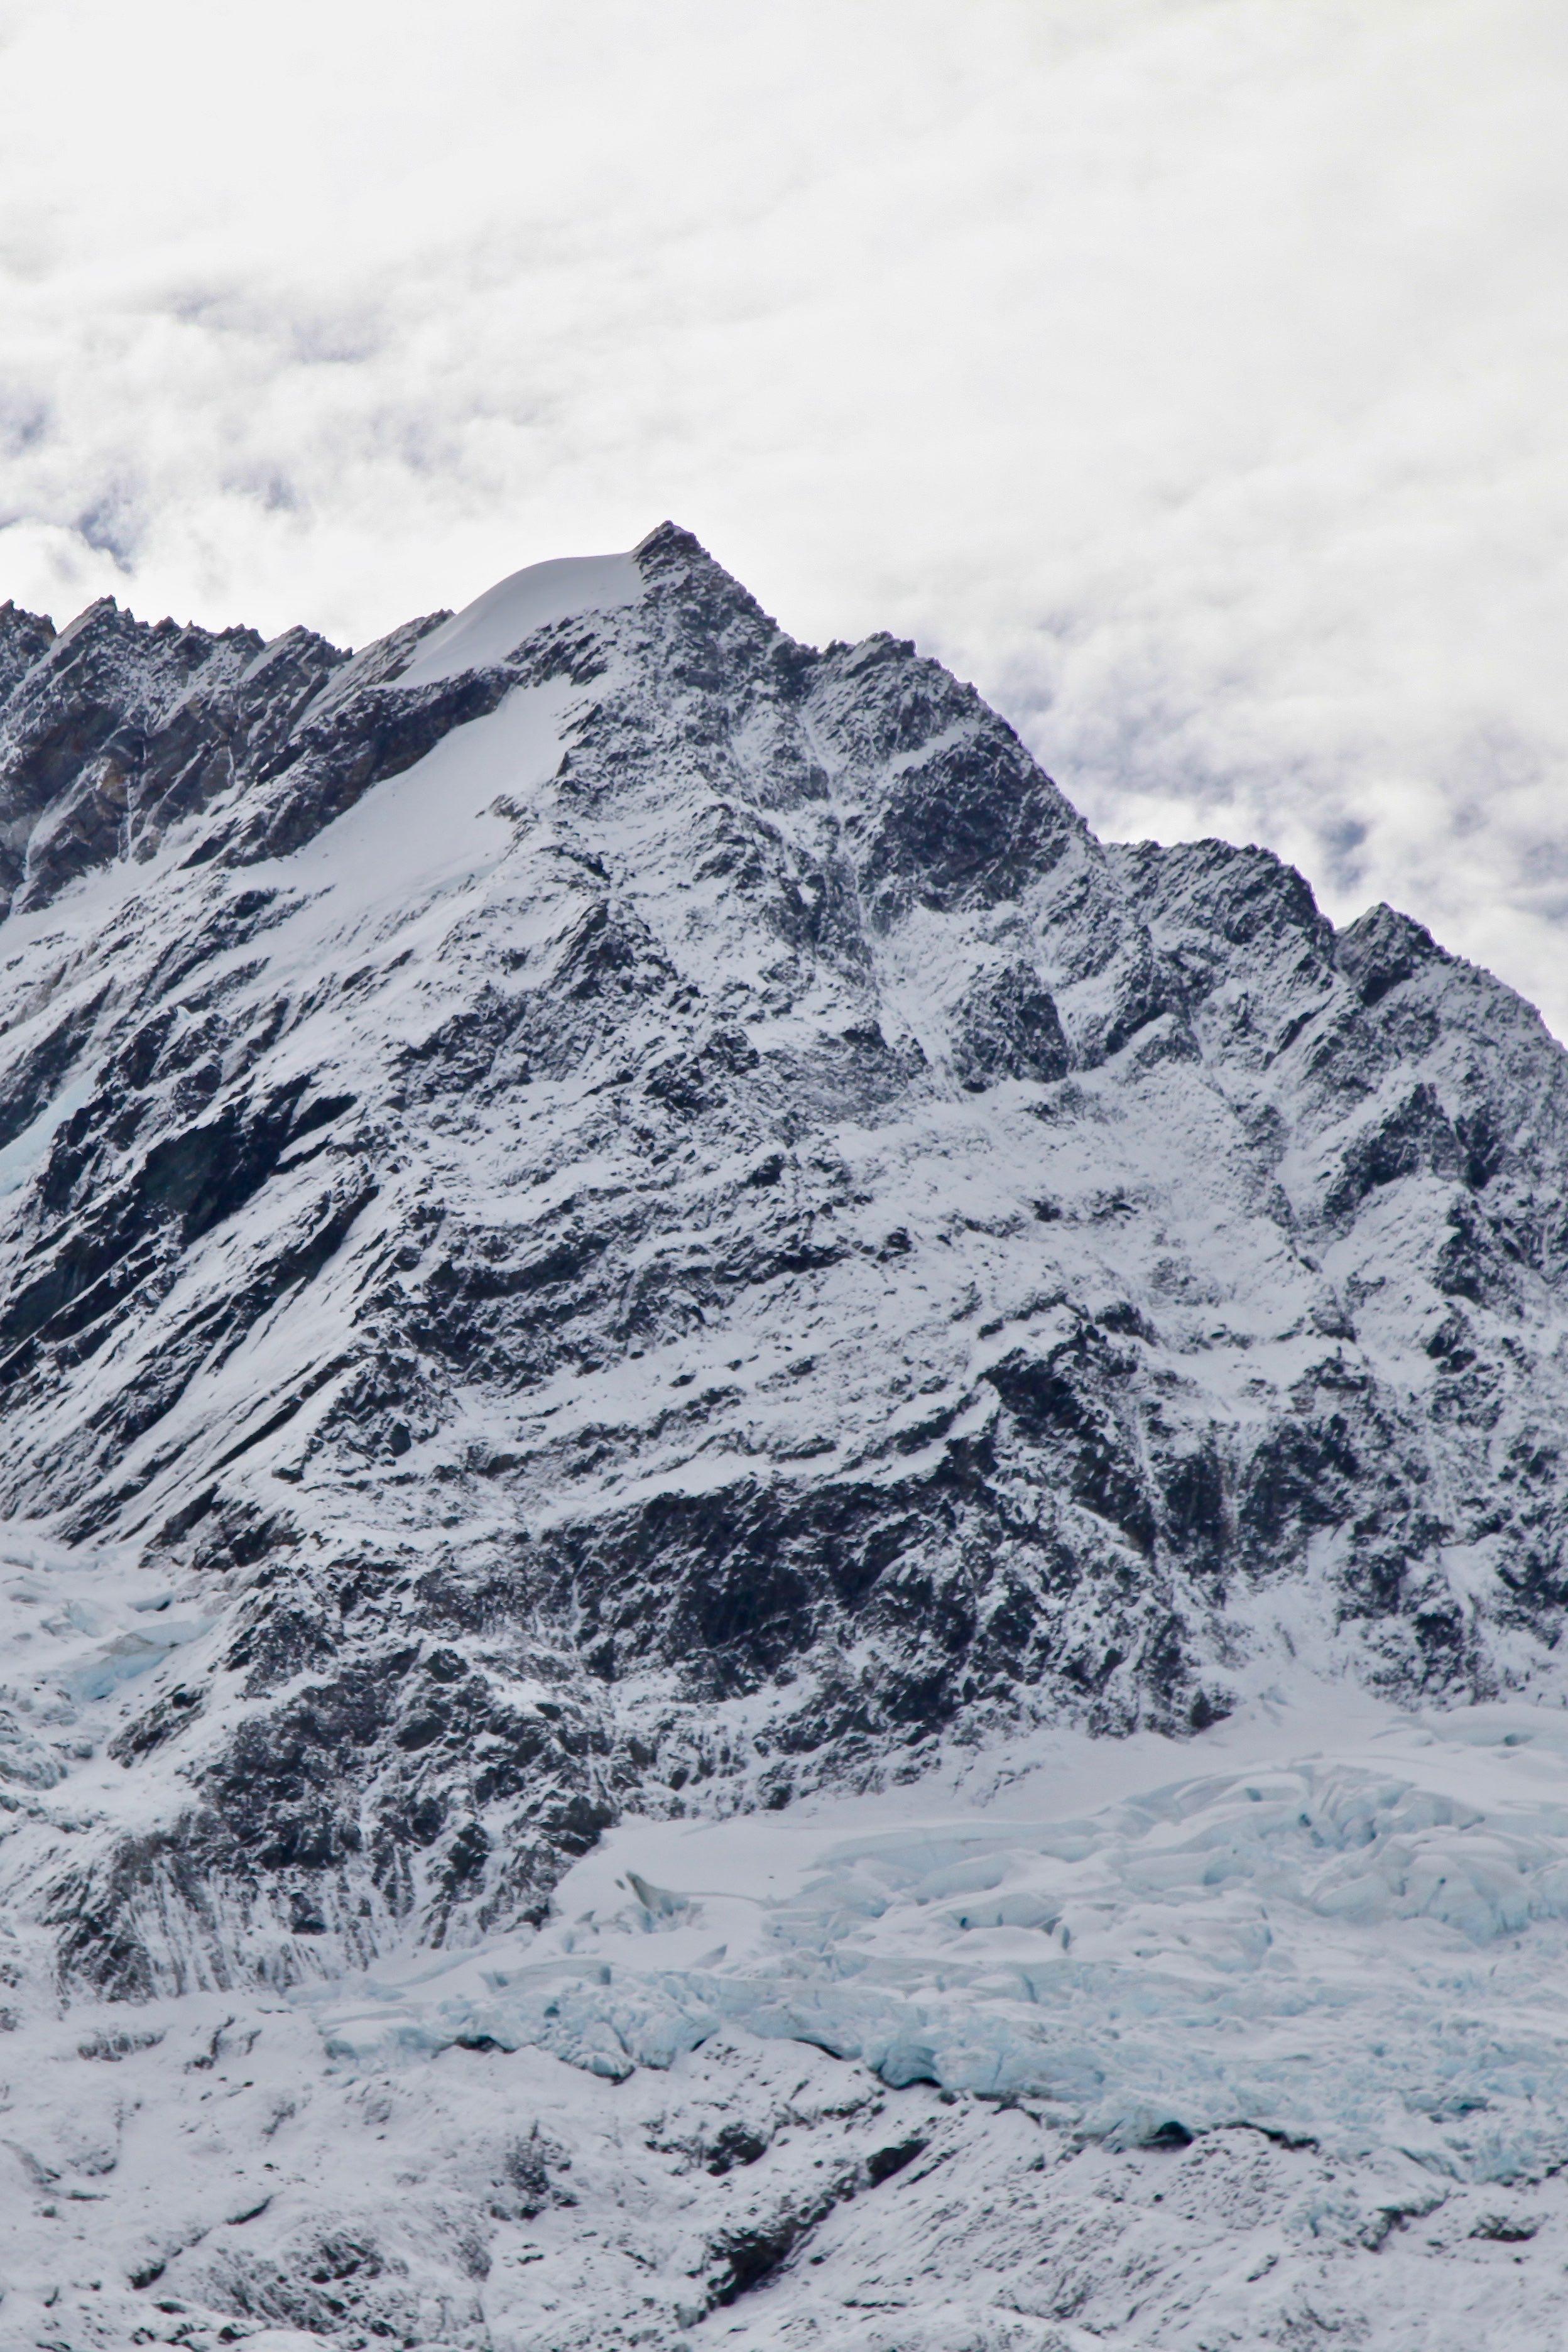 rob-roy-glacier-mt-aspiring-national-park.jpg